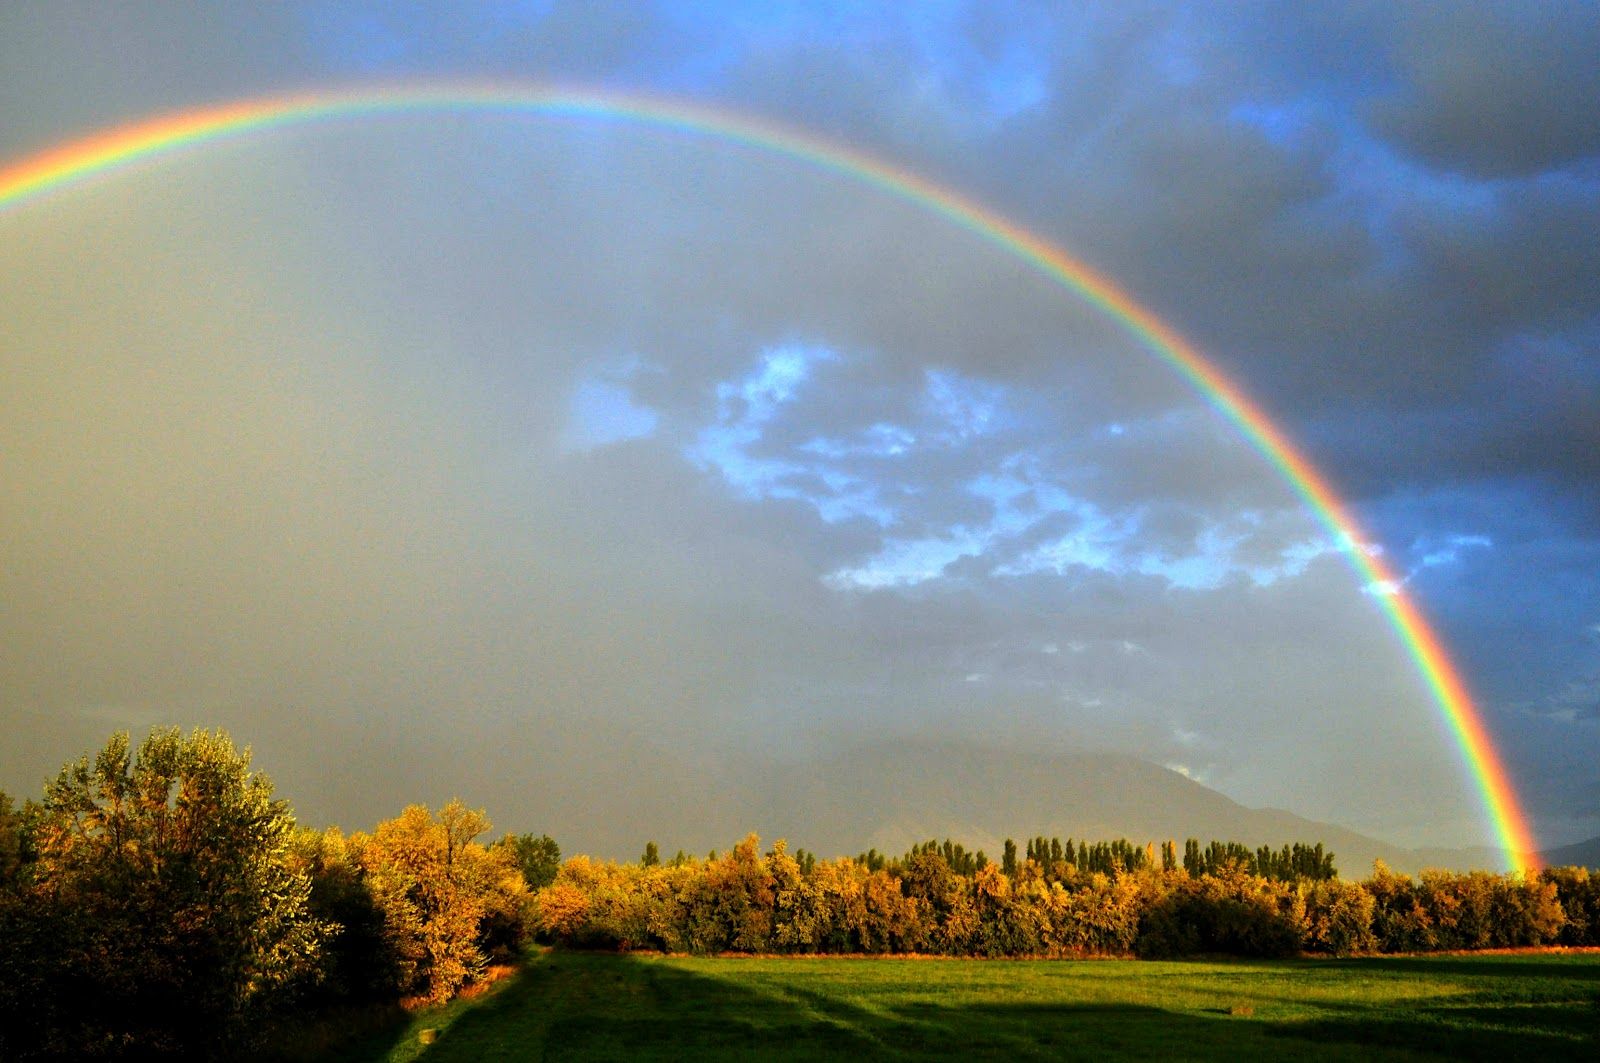 rubowhappenings: Rainbows